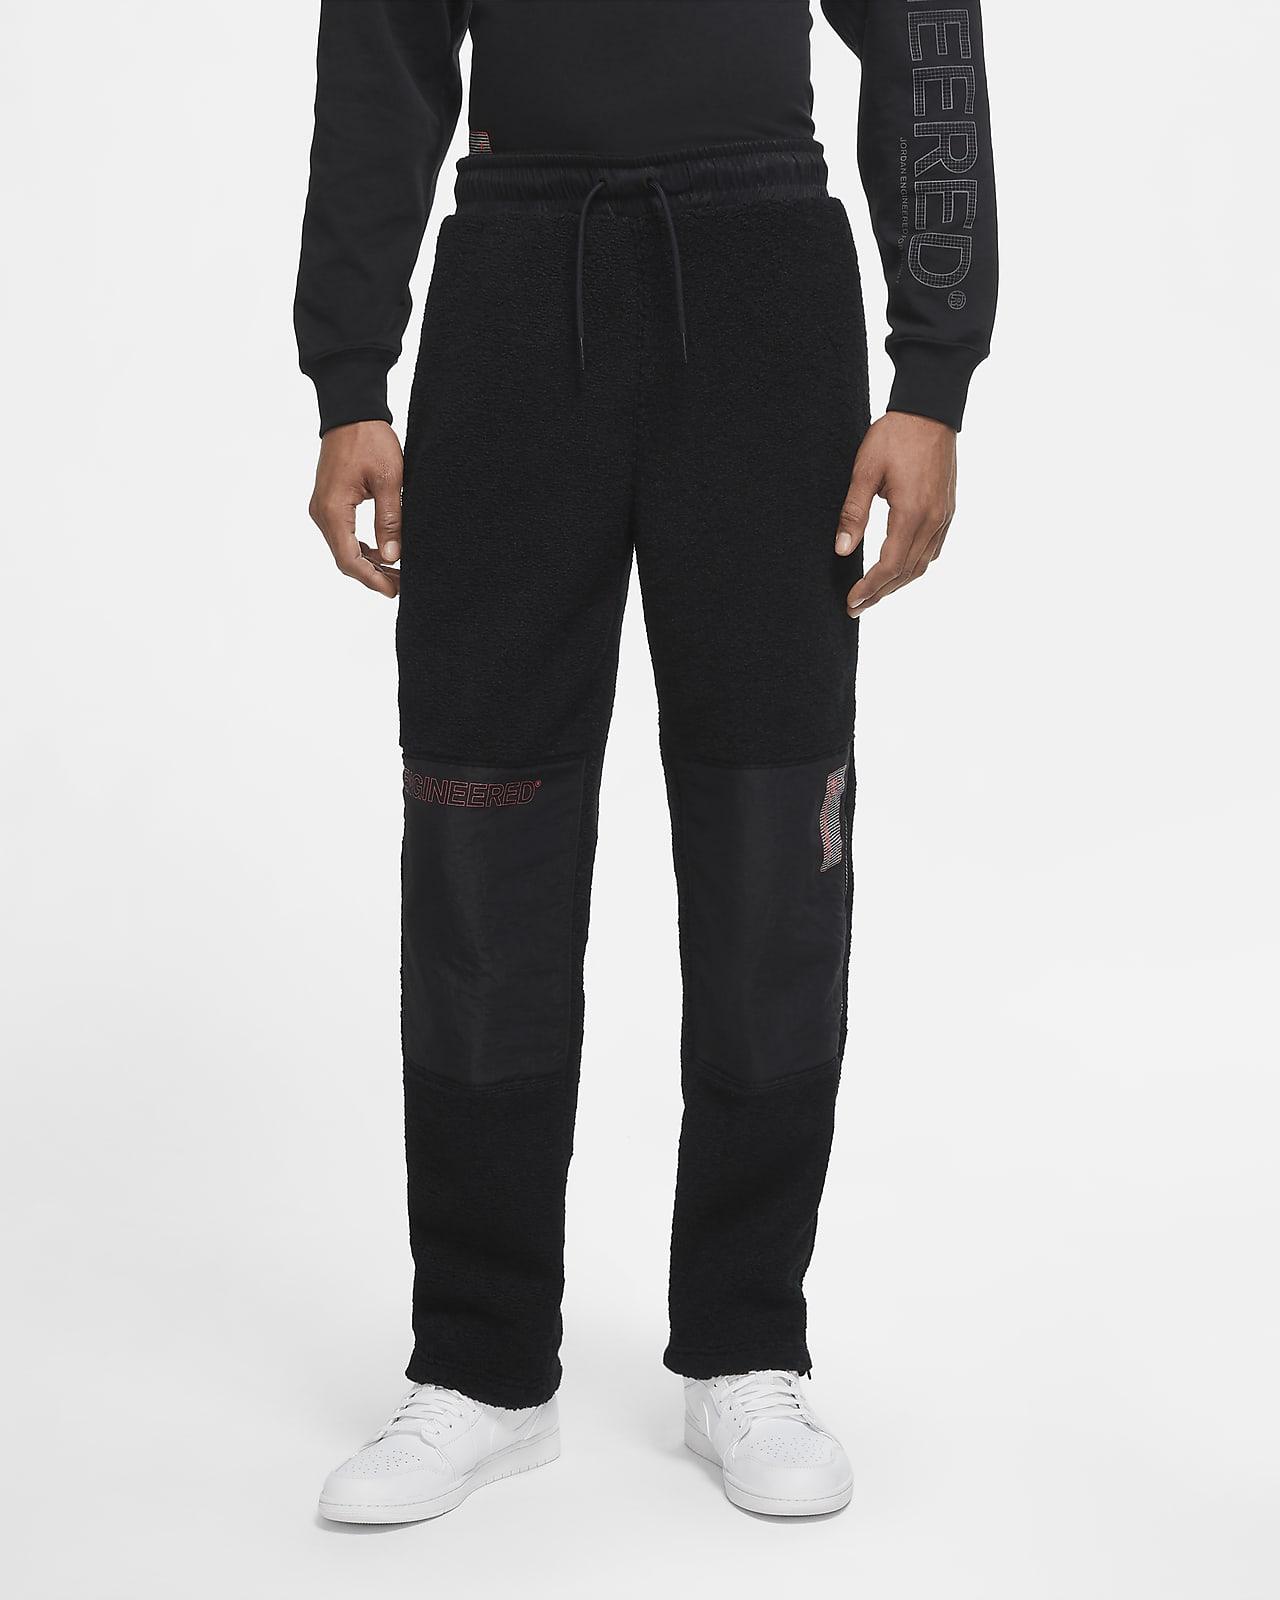 Pantalon en tissu Fleece à zip Jordan 23 Engineered pour Homme